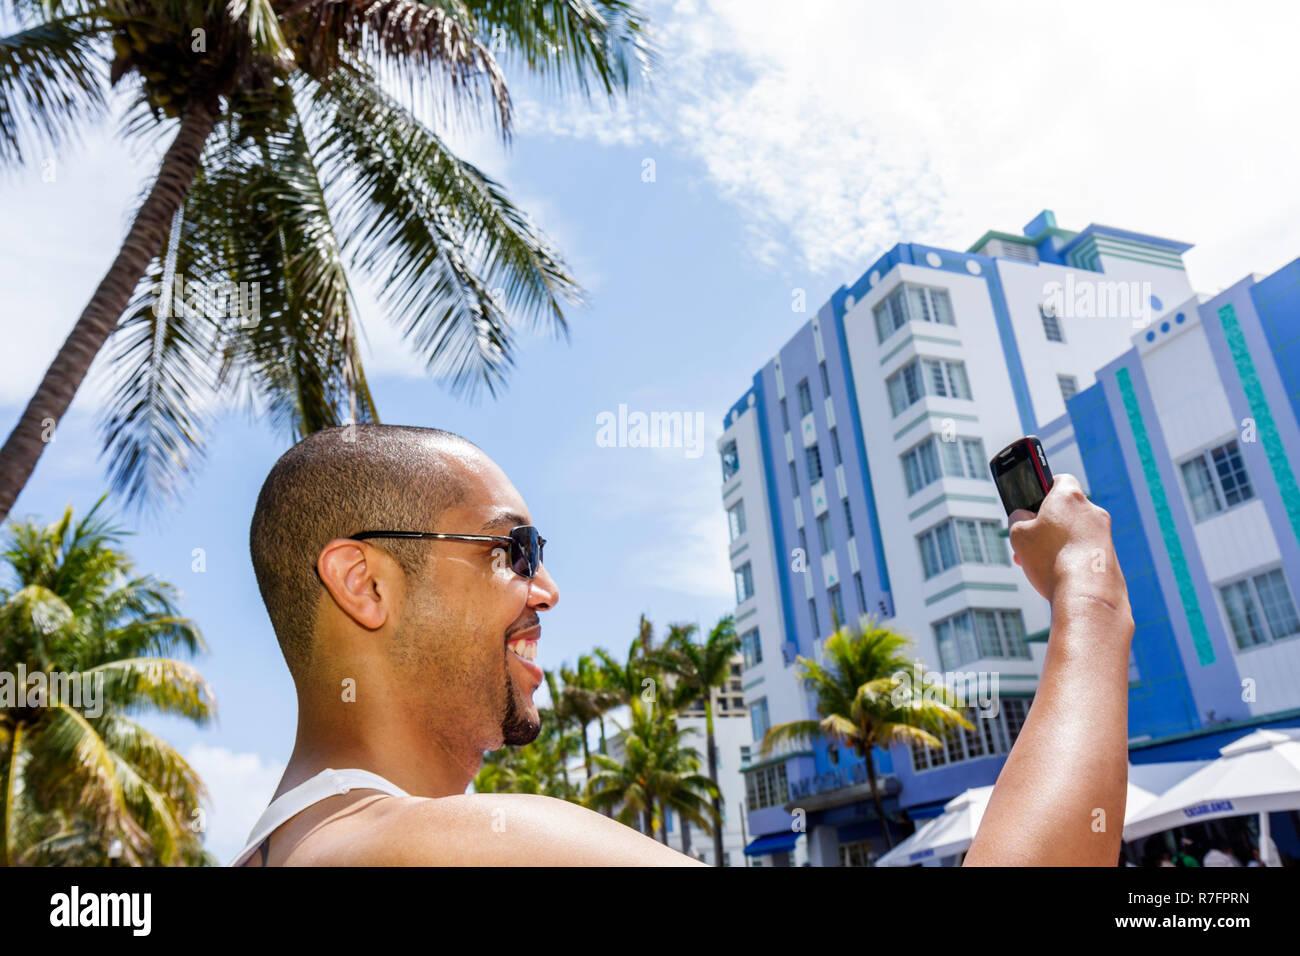 Miami Beach Florida Ocean Drive Art Deco District Urban Beach Week Spring Break Memorial Day Weekend hip hop culture Black man - Stock Image